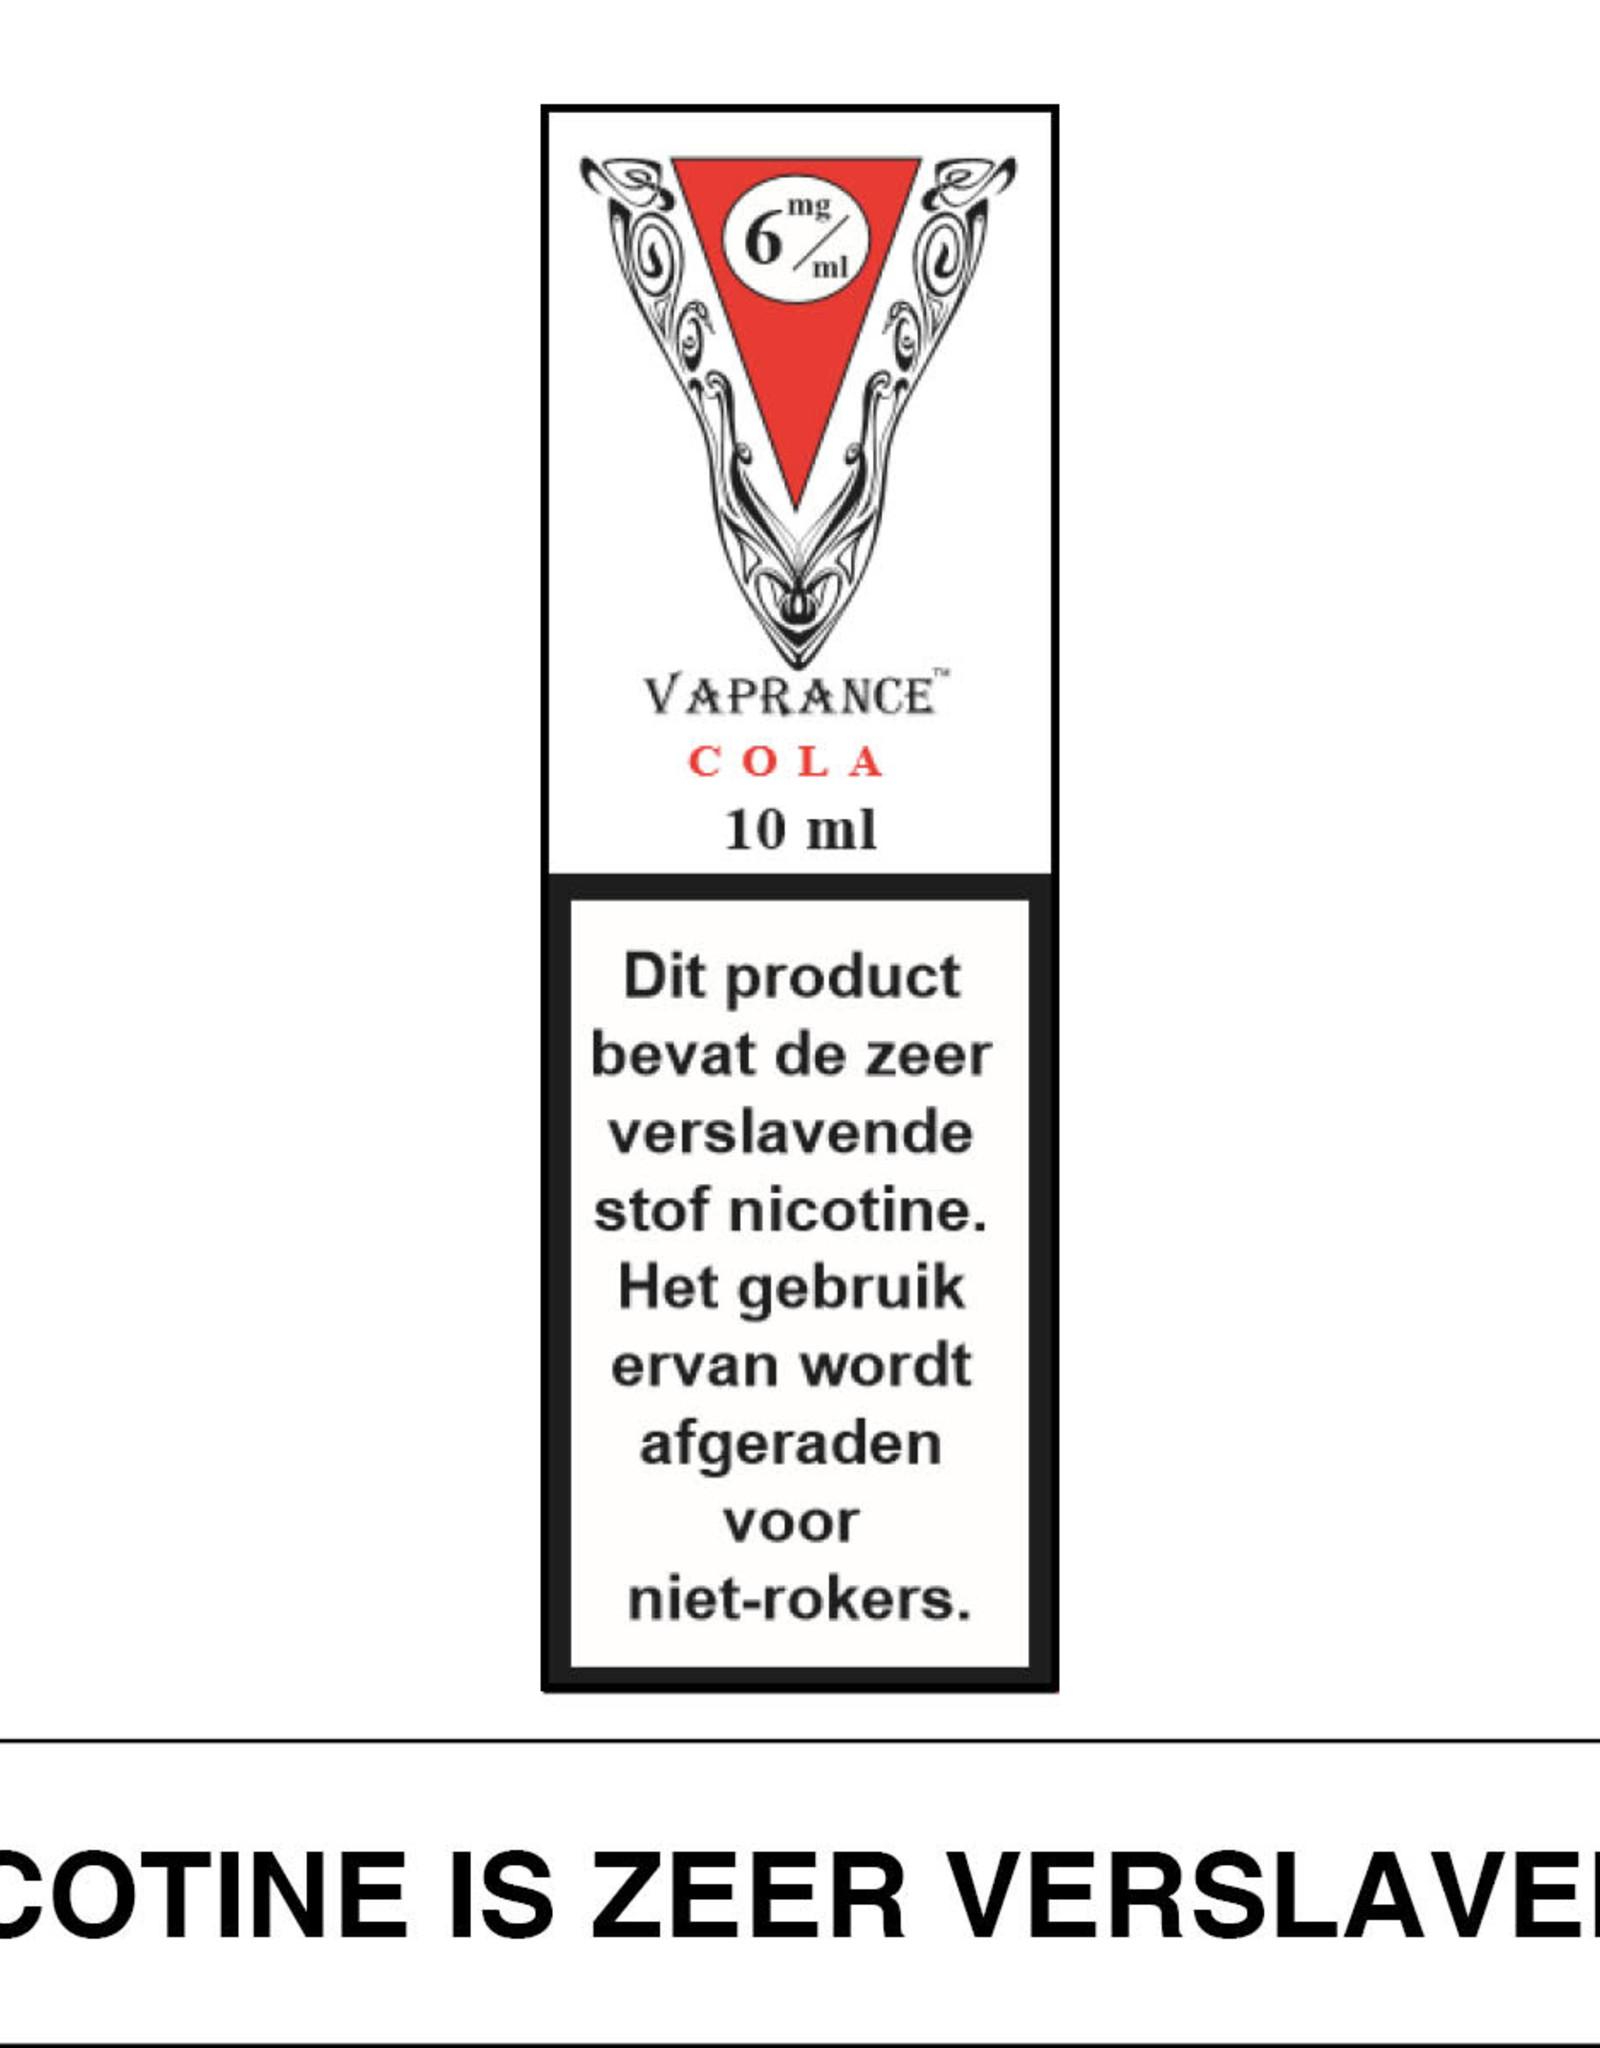 Vaprance Vaprance White Label Cola 6 mg Nicotine